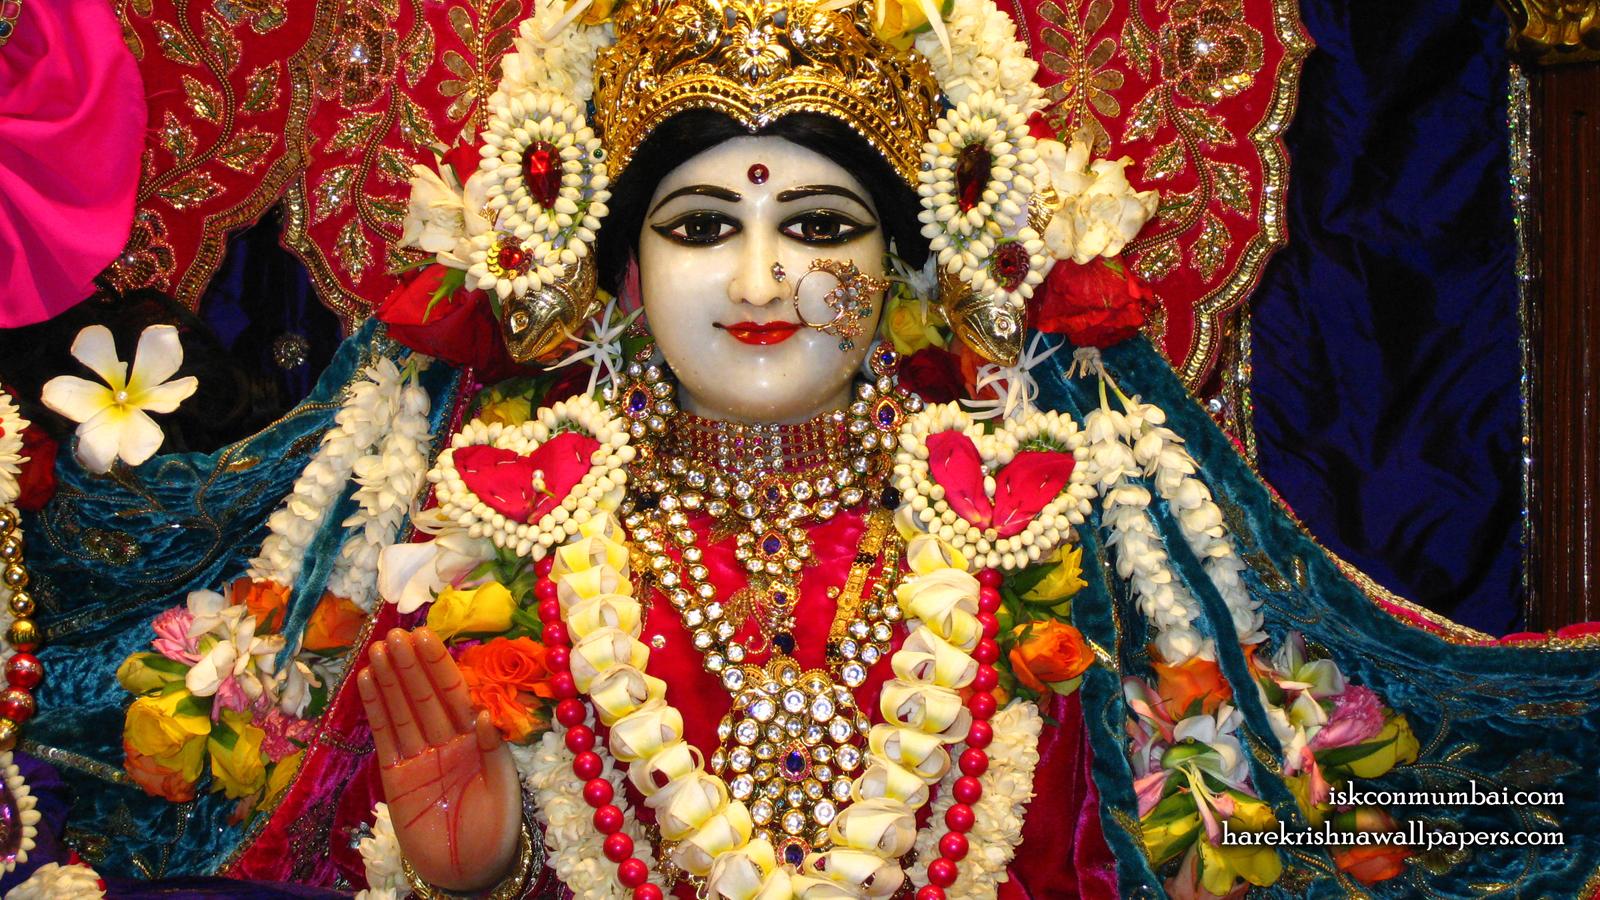 Sri Radha Face Wallpaper (003) Size 1600x900 Download